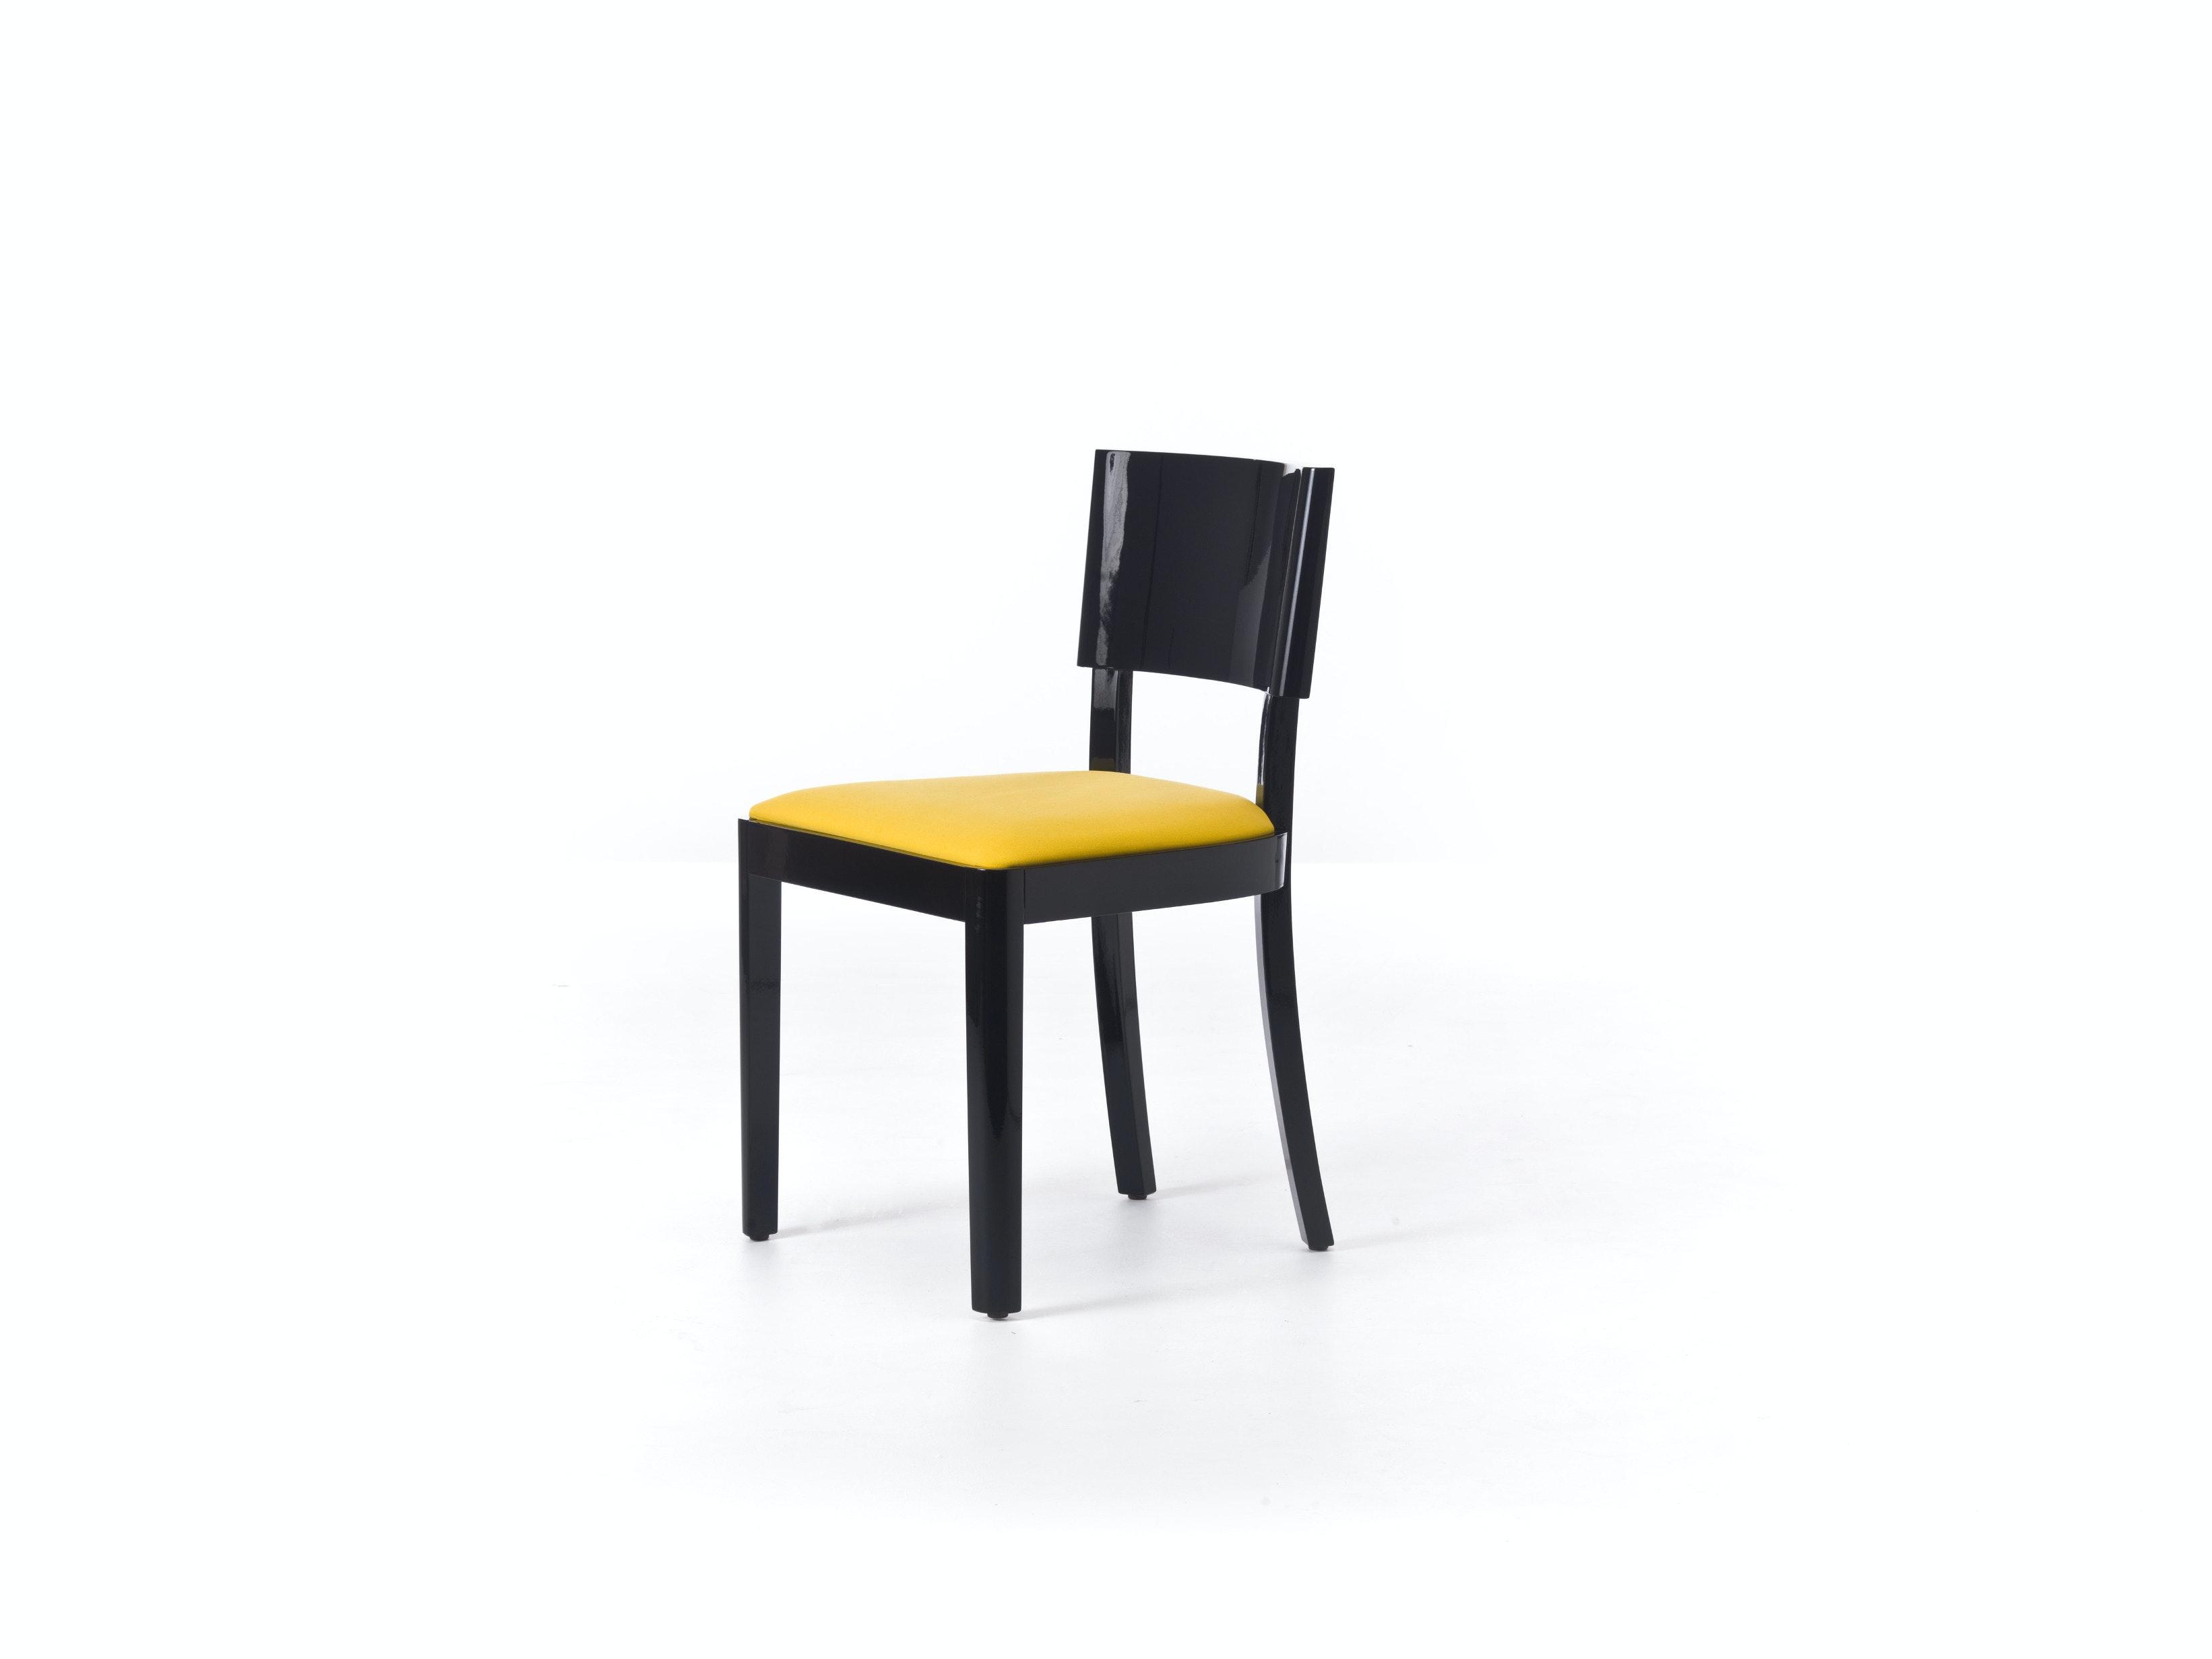 Marlene Chair Sillhouette1